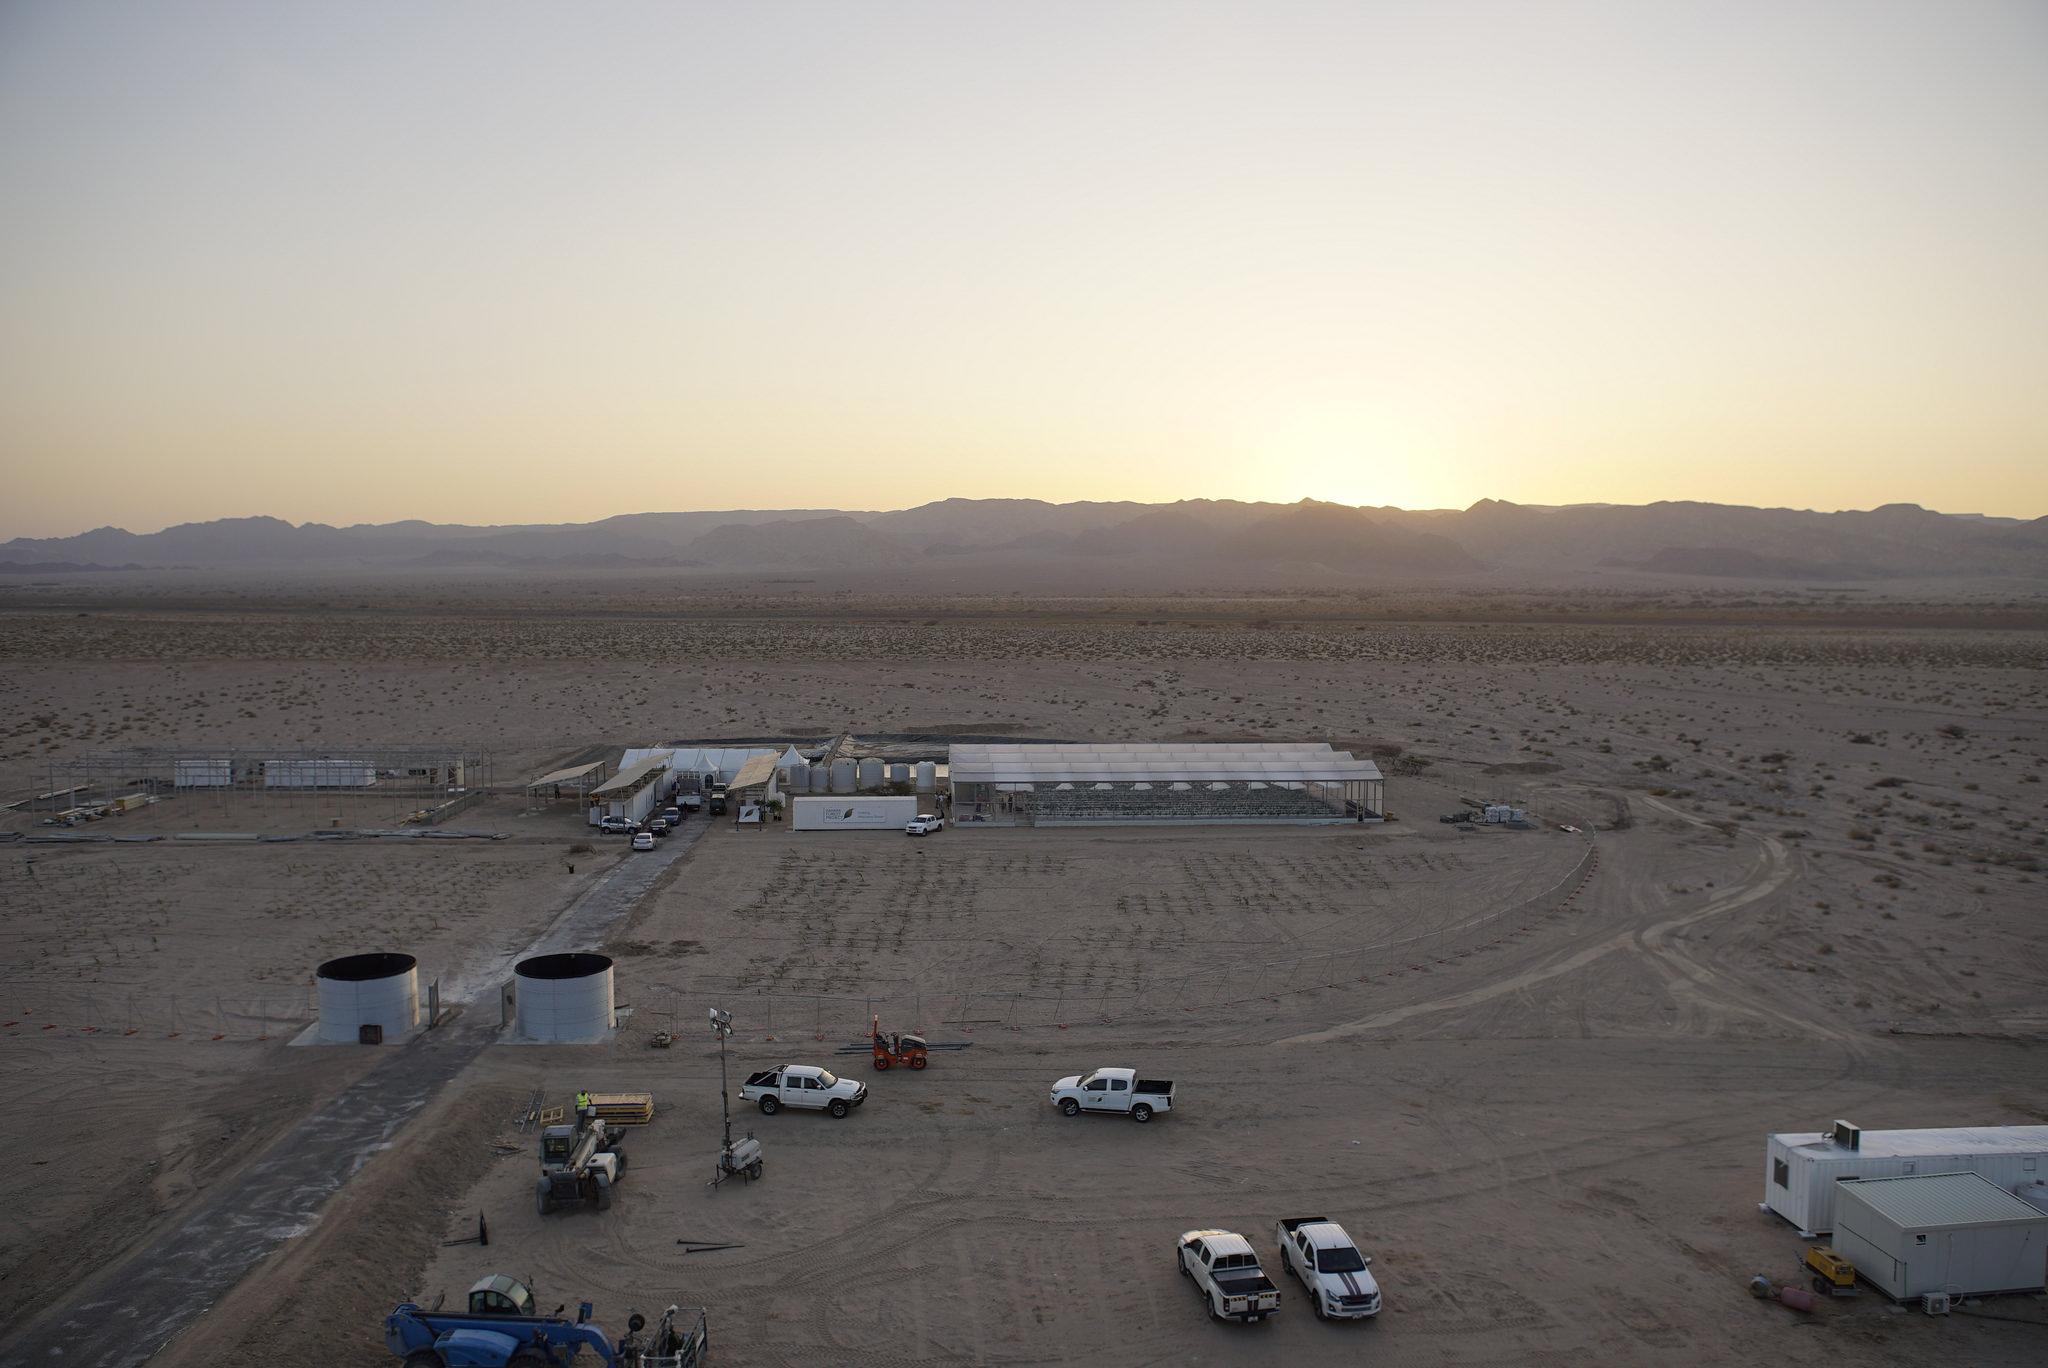 SFP in Jordan